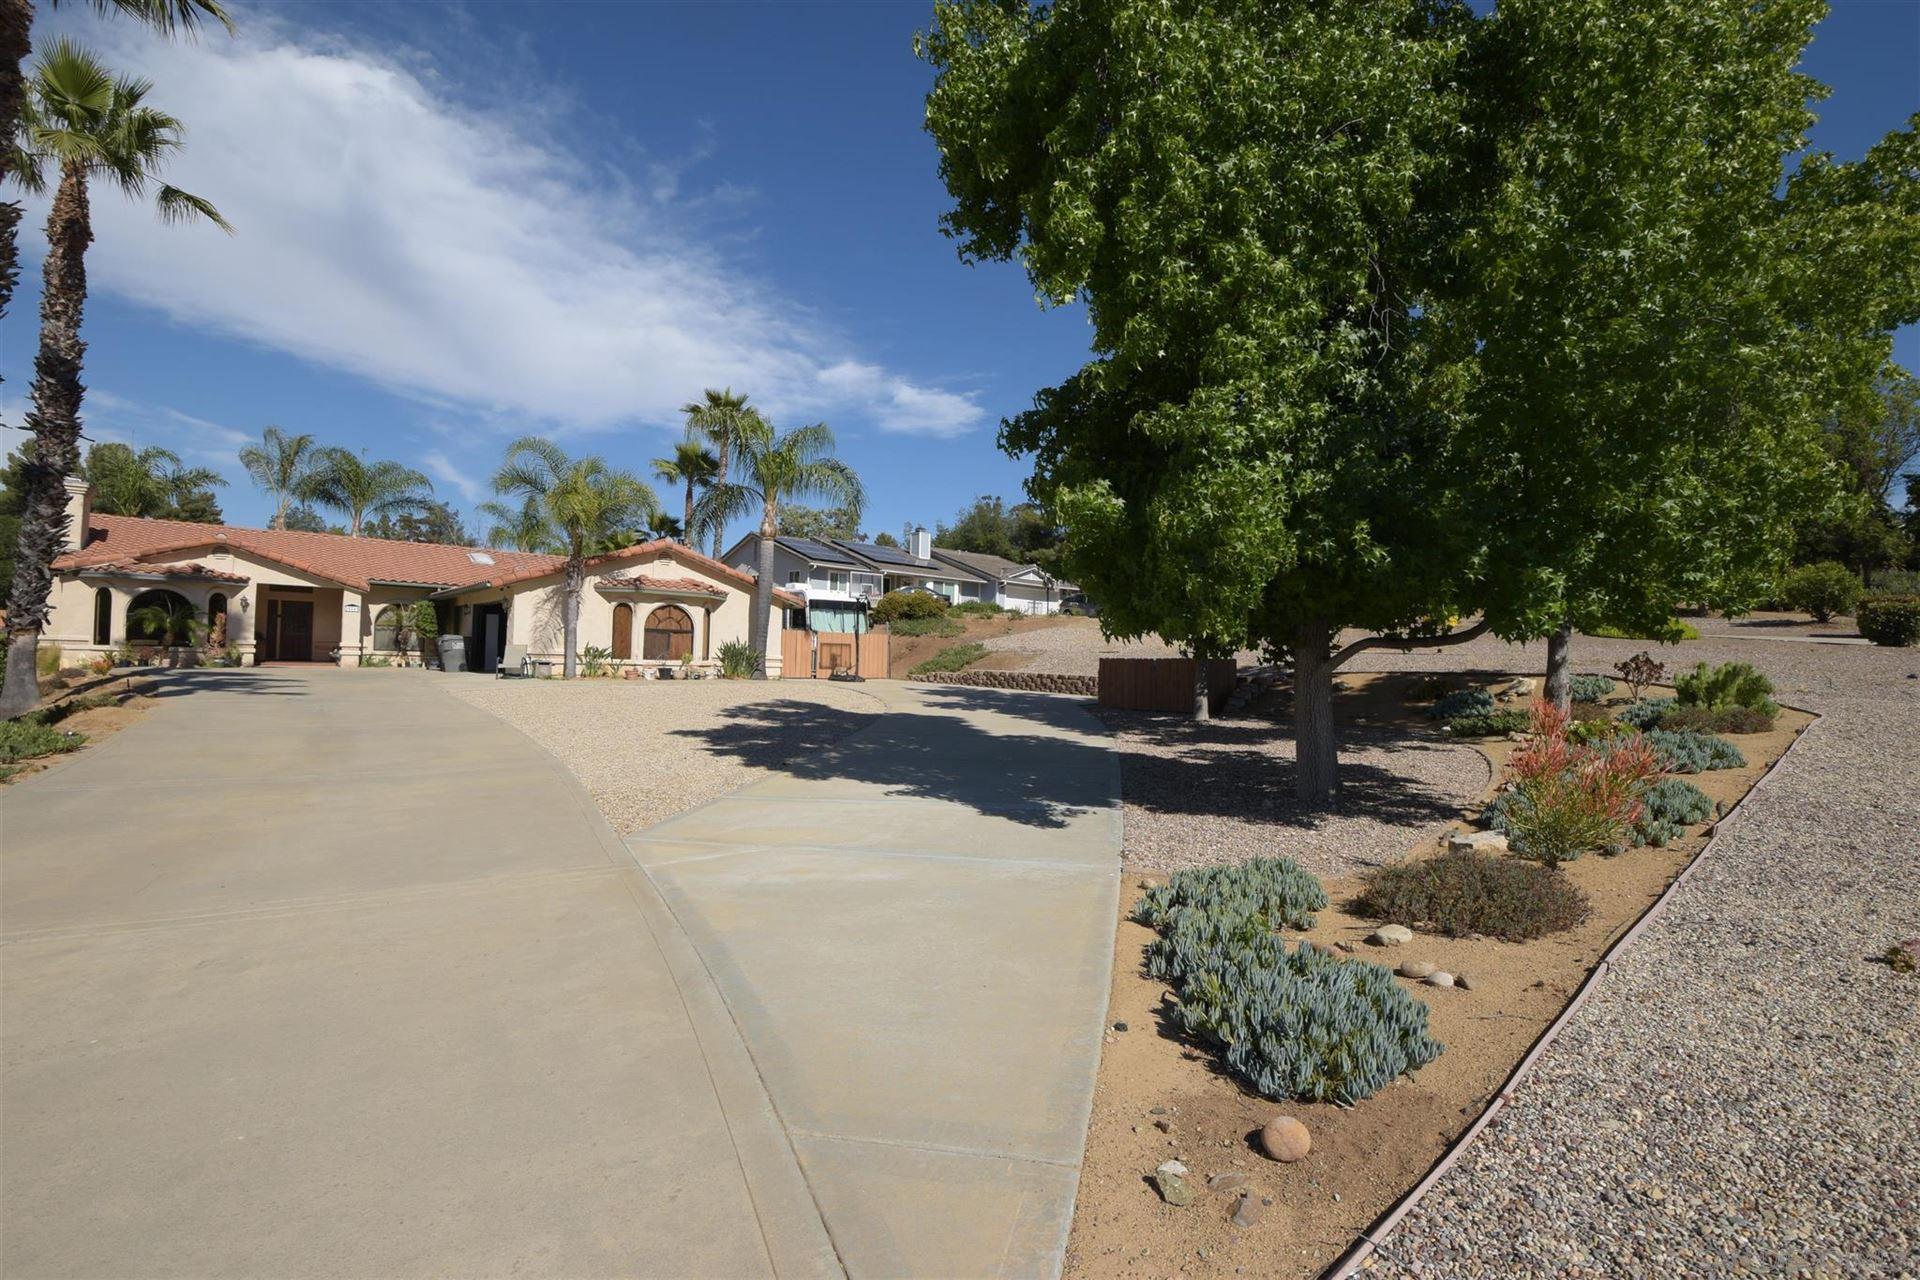 Photo of 25245 HEREFORD DRIVE, RAMONA, CA 92065 (MLS # 210015927)